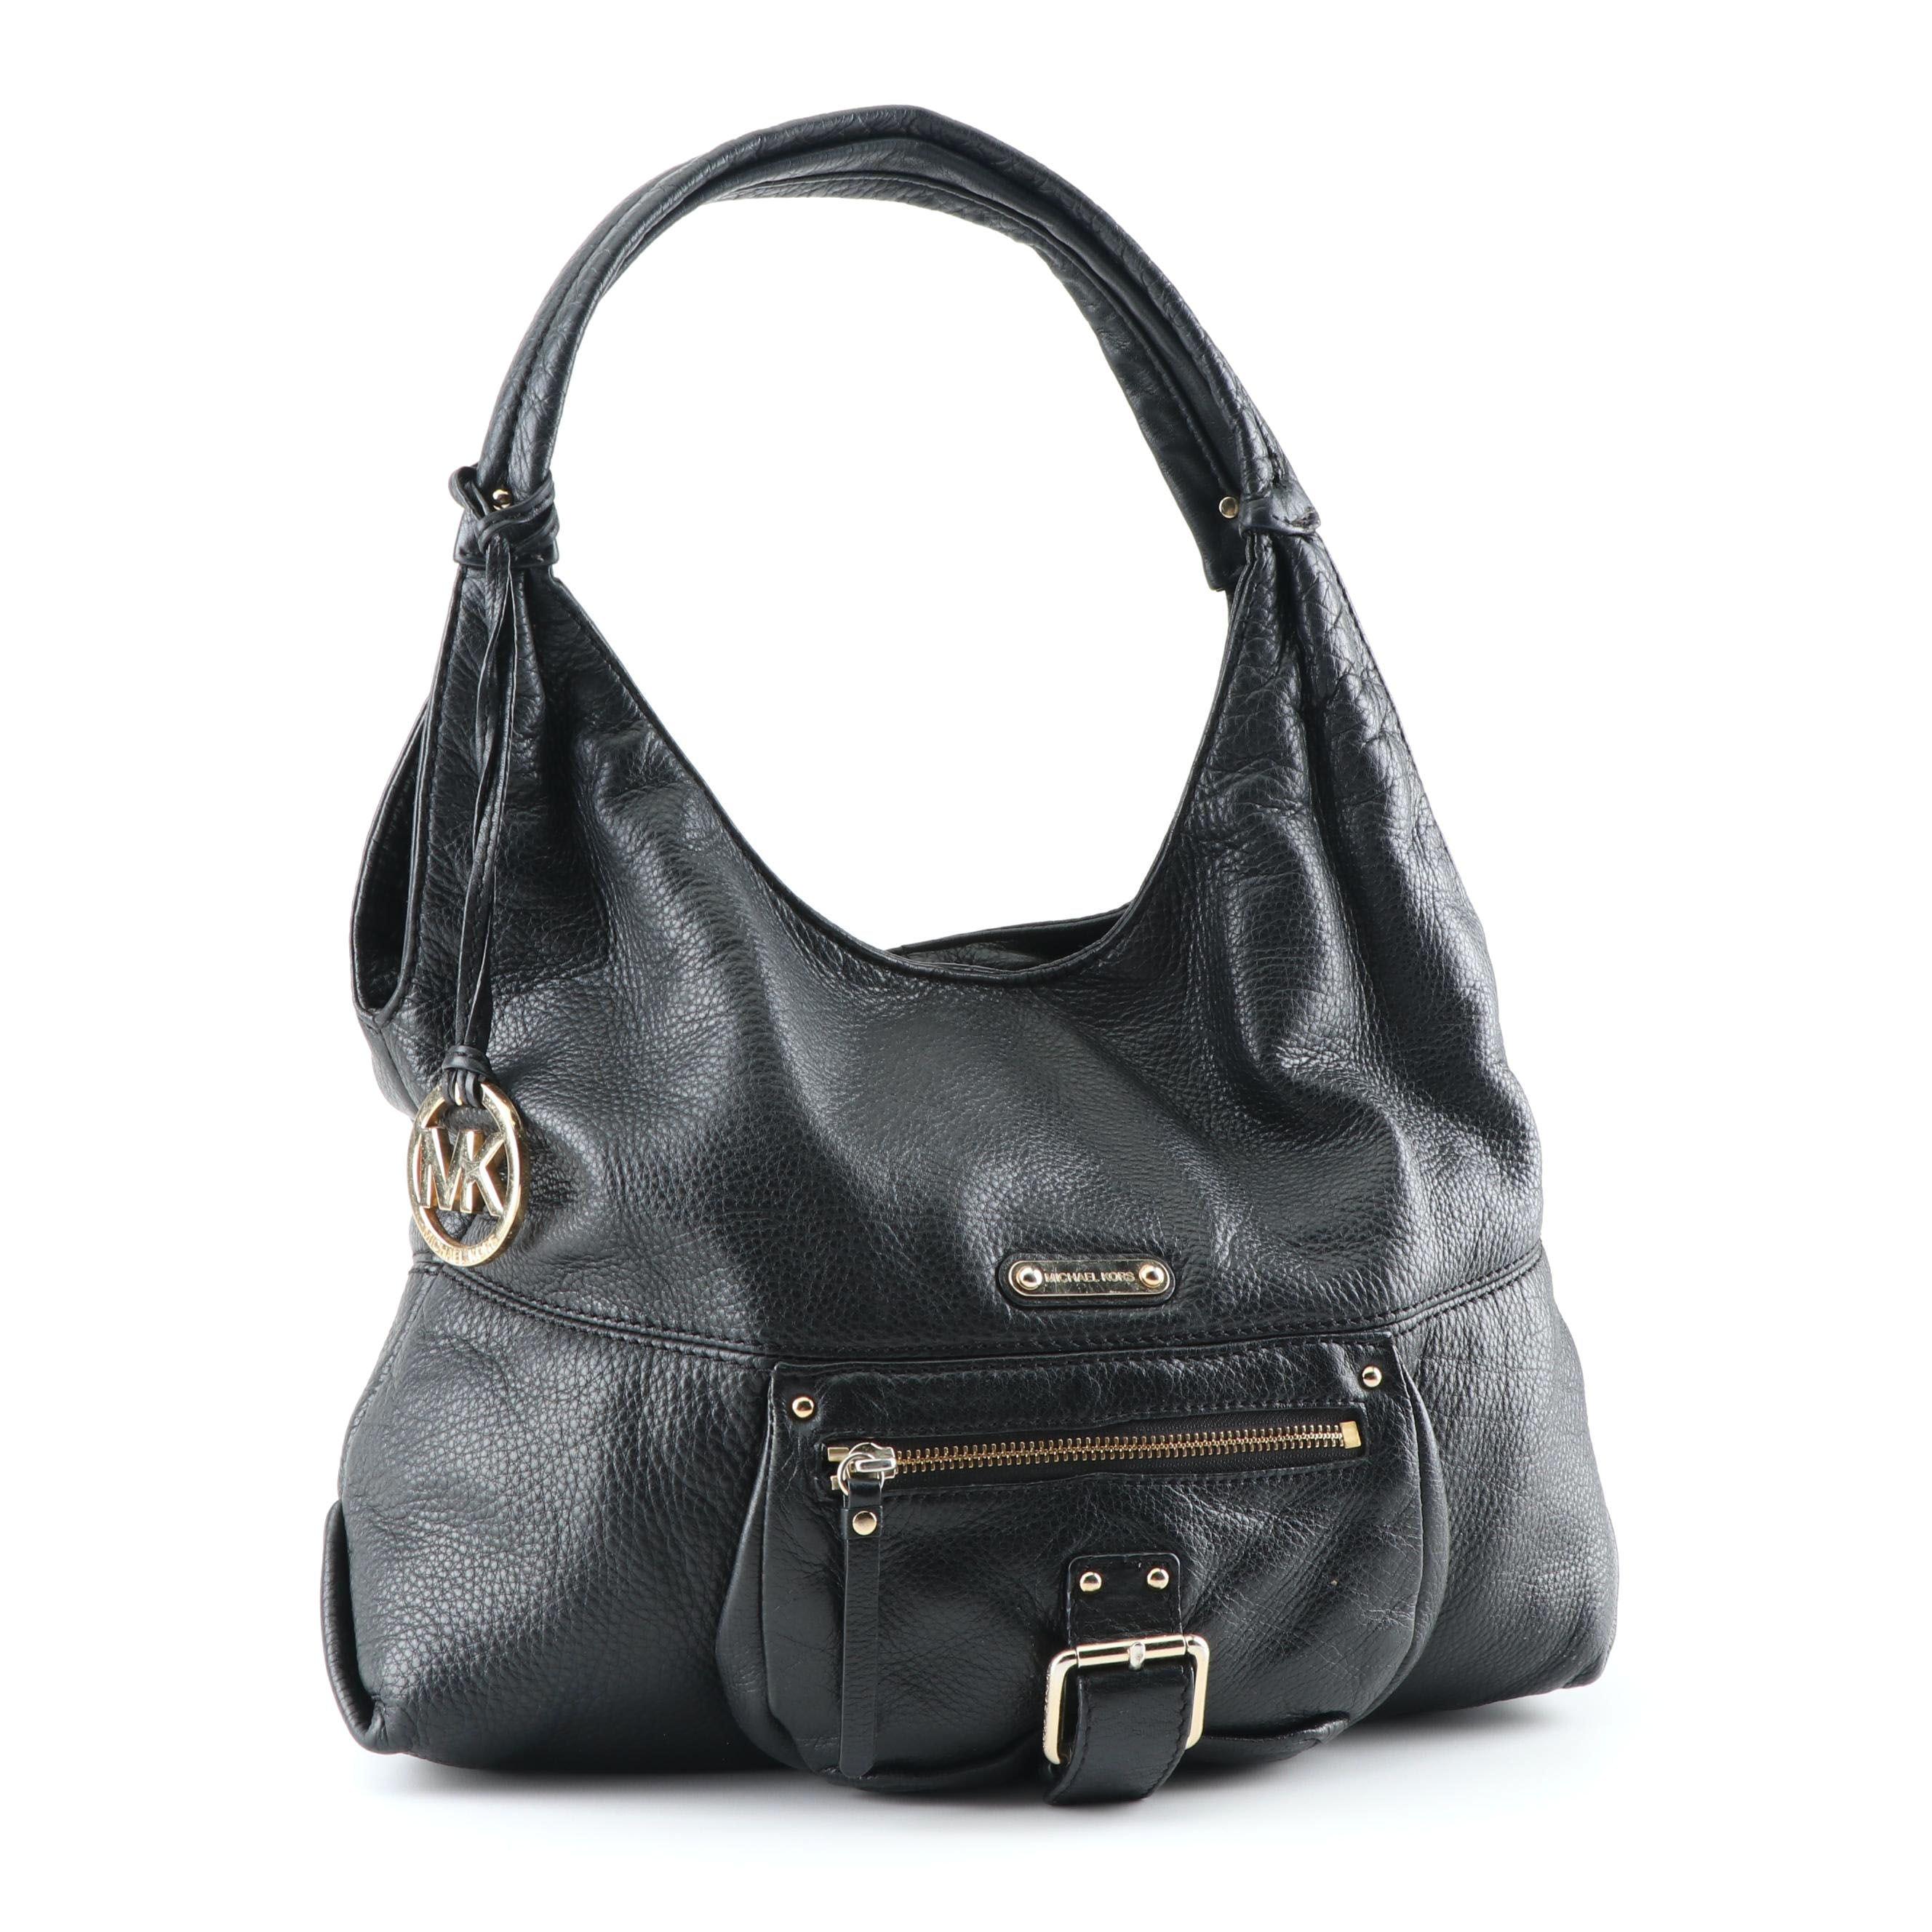 MICHAEL Michael Kors Black Pebbled Leather Hobo Bag